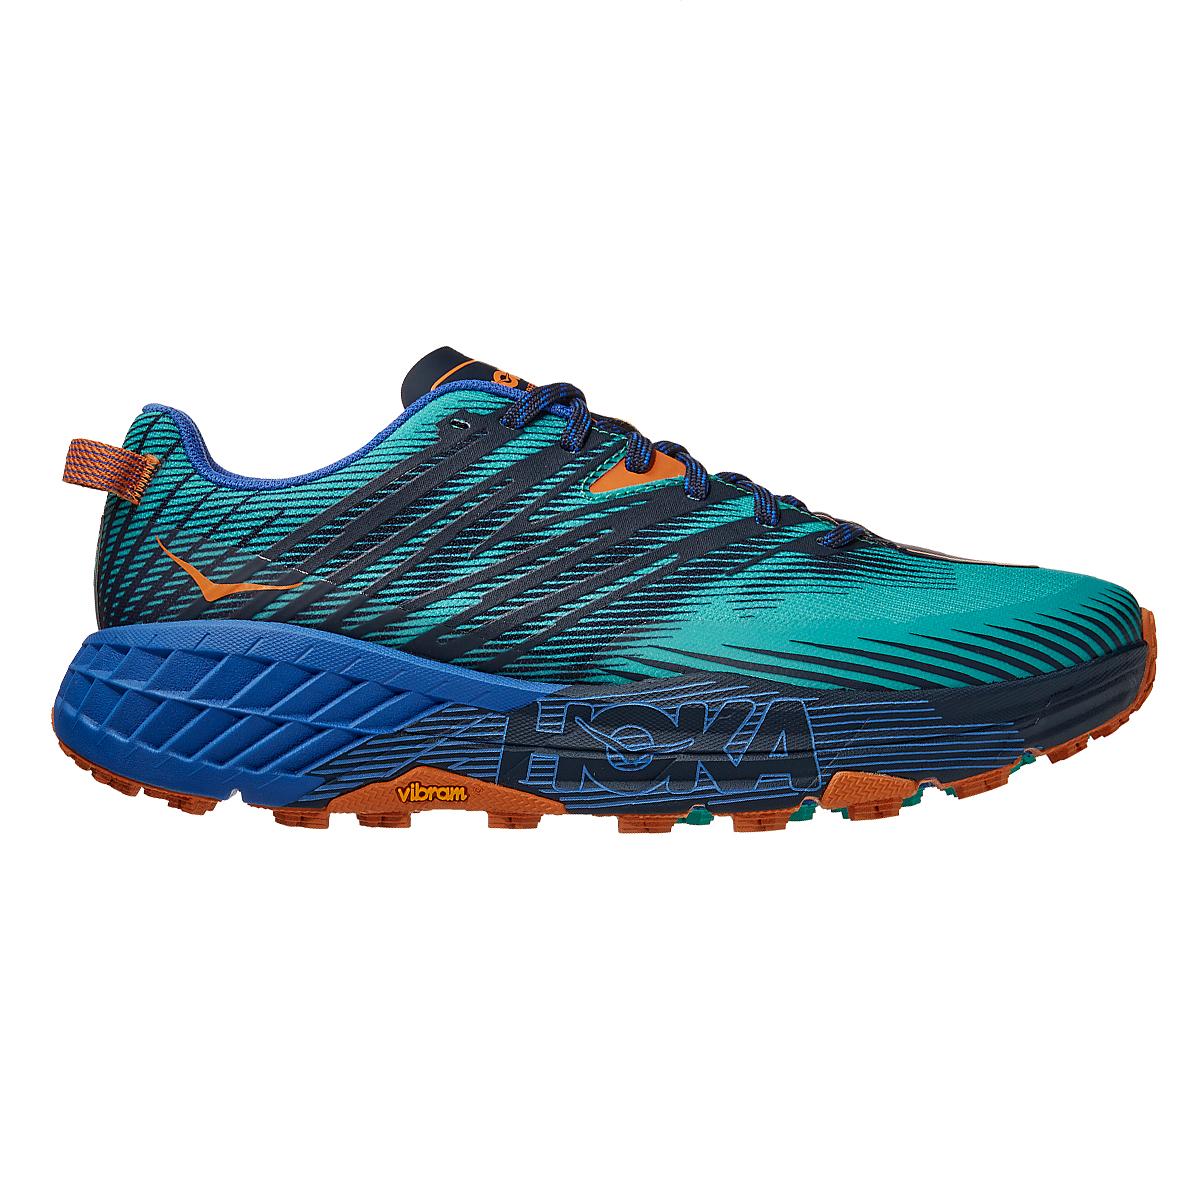 Men's Hoka One One Speedgoat 4 Trail Running Shoe - Color: Atlantis/Dazzling Blue - Size: 7 - Width: Regular, Atlantis/Dazzling Blue, large, image 1